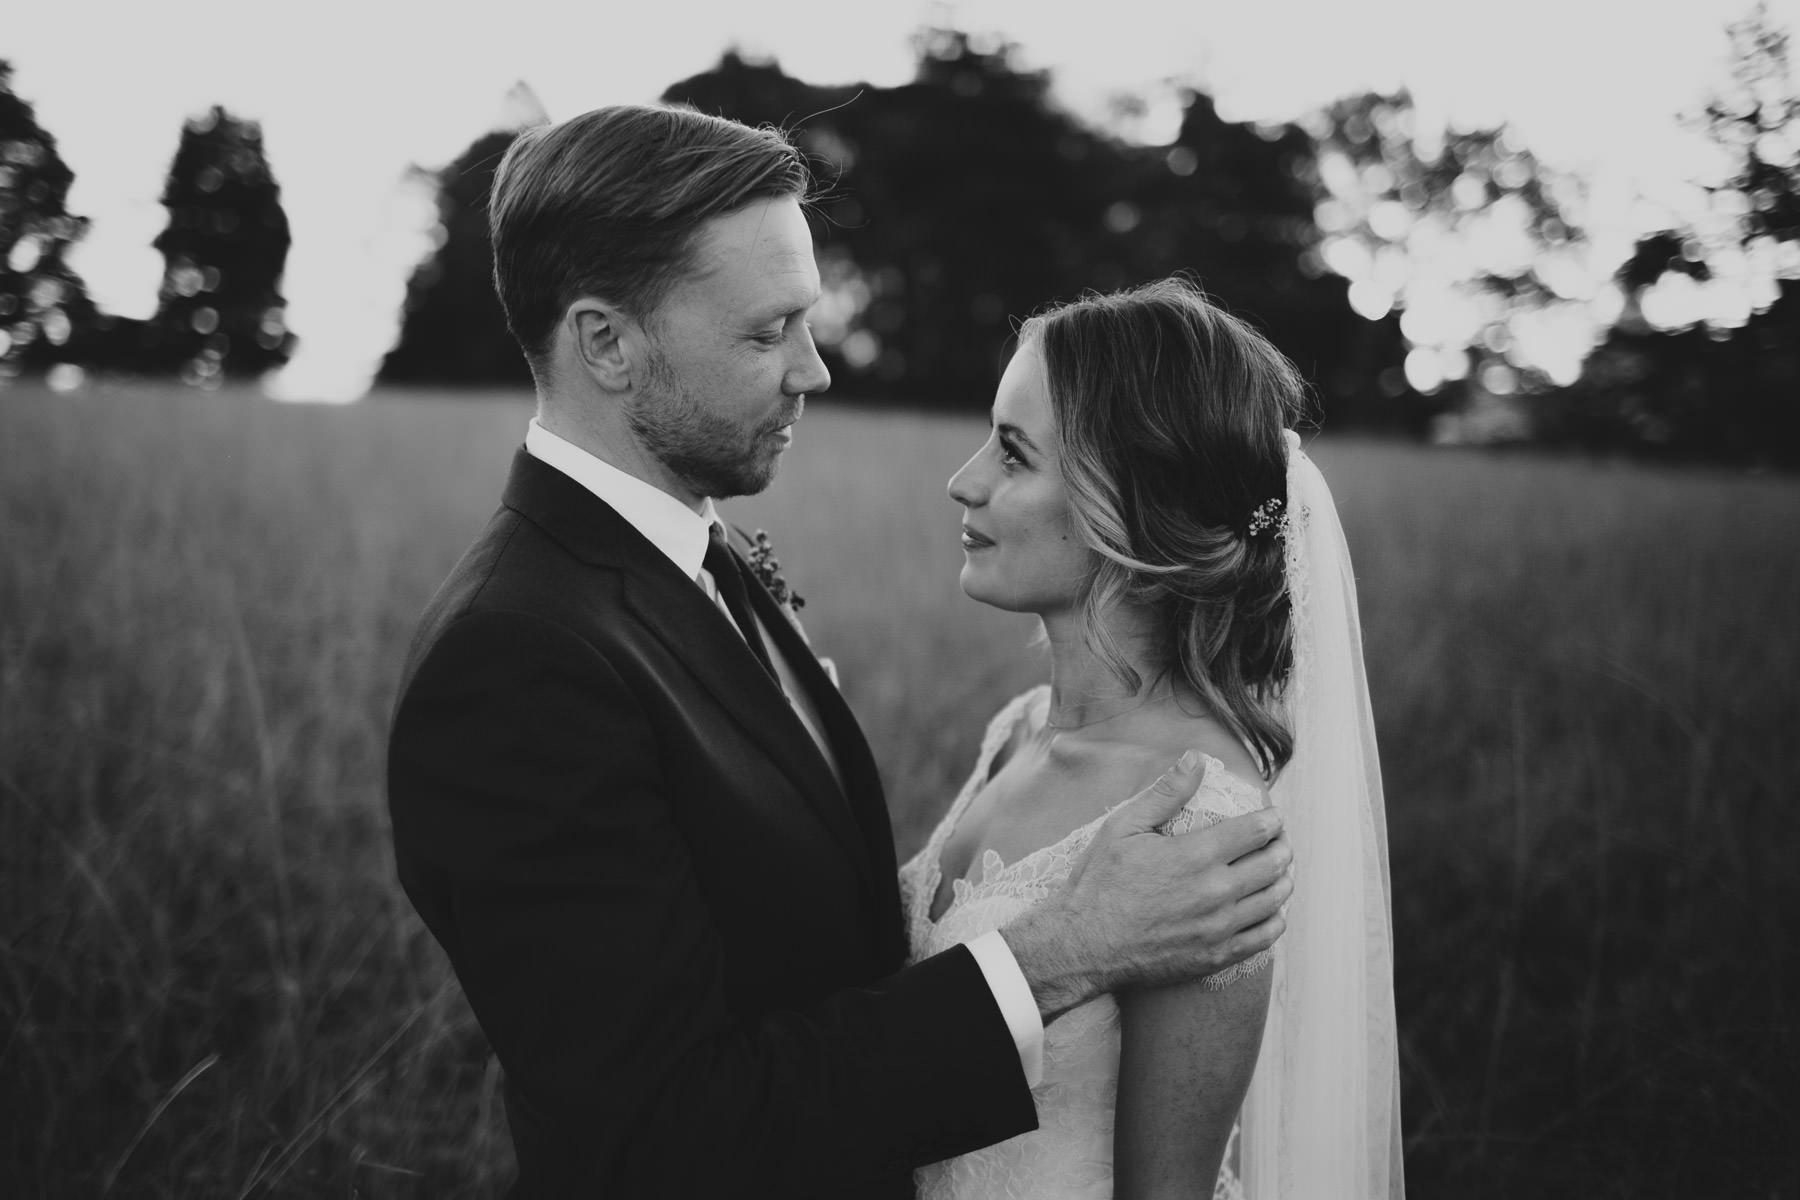 160506_justinaaron_wedding_holly_daniel_pr-176.jpg